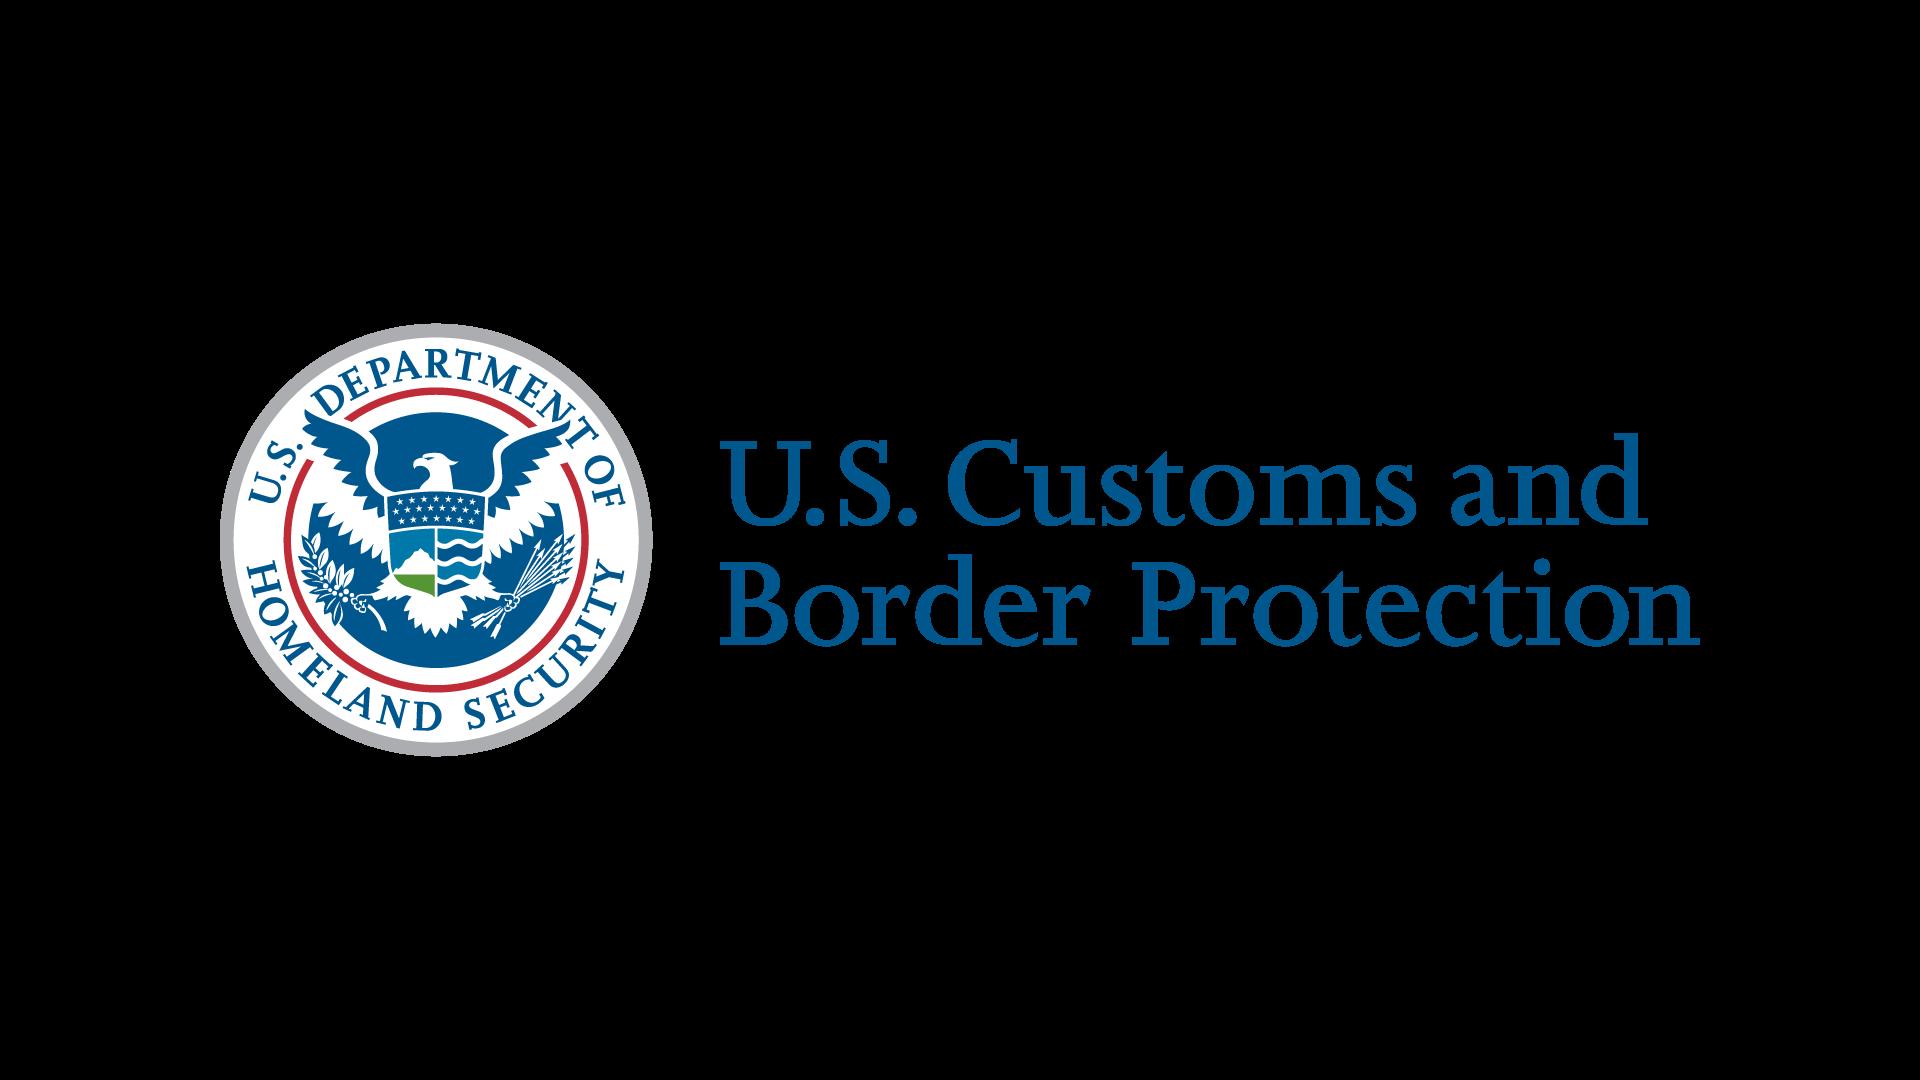 U S Customs And Border Protection  >> Us Customs And Border Protection Ring The Nyse Opening Bell